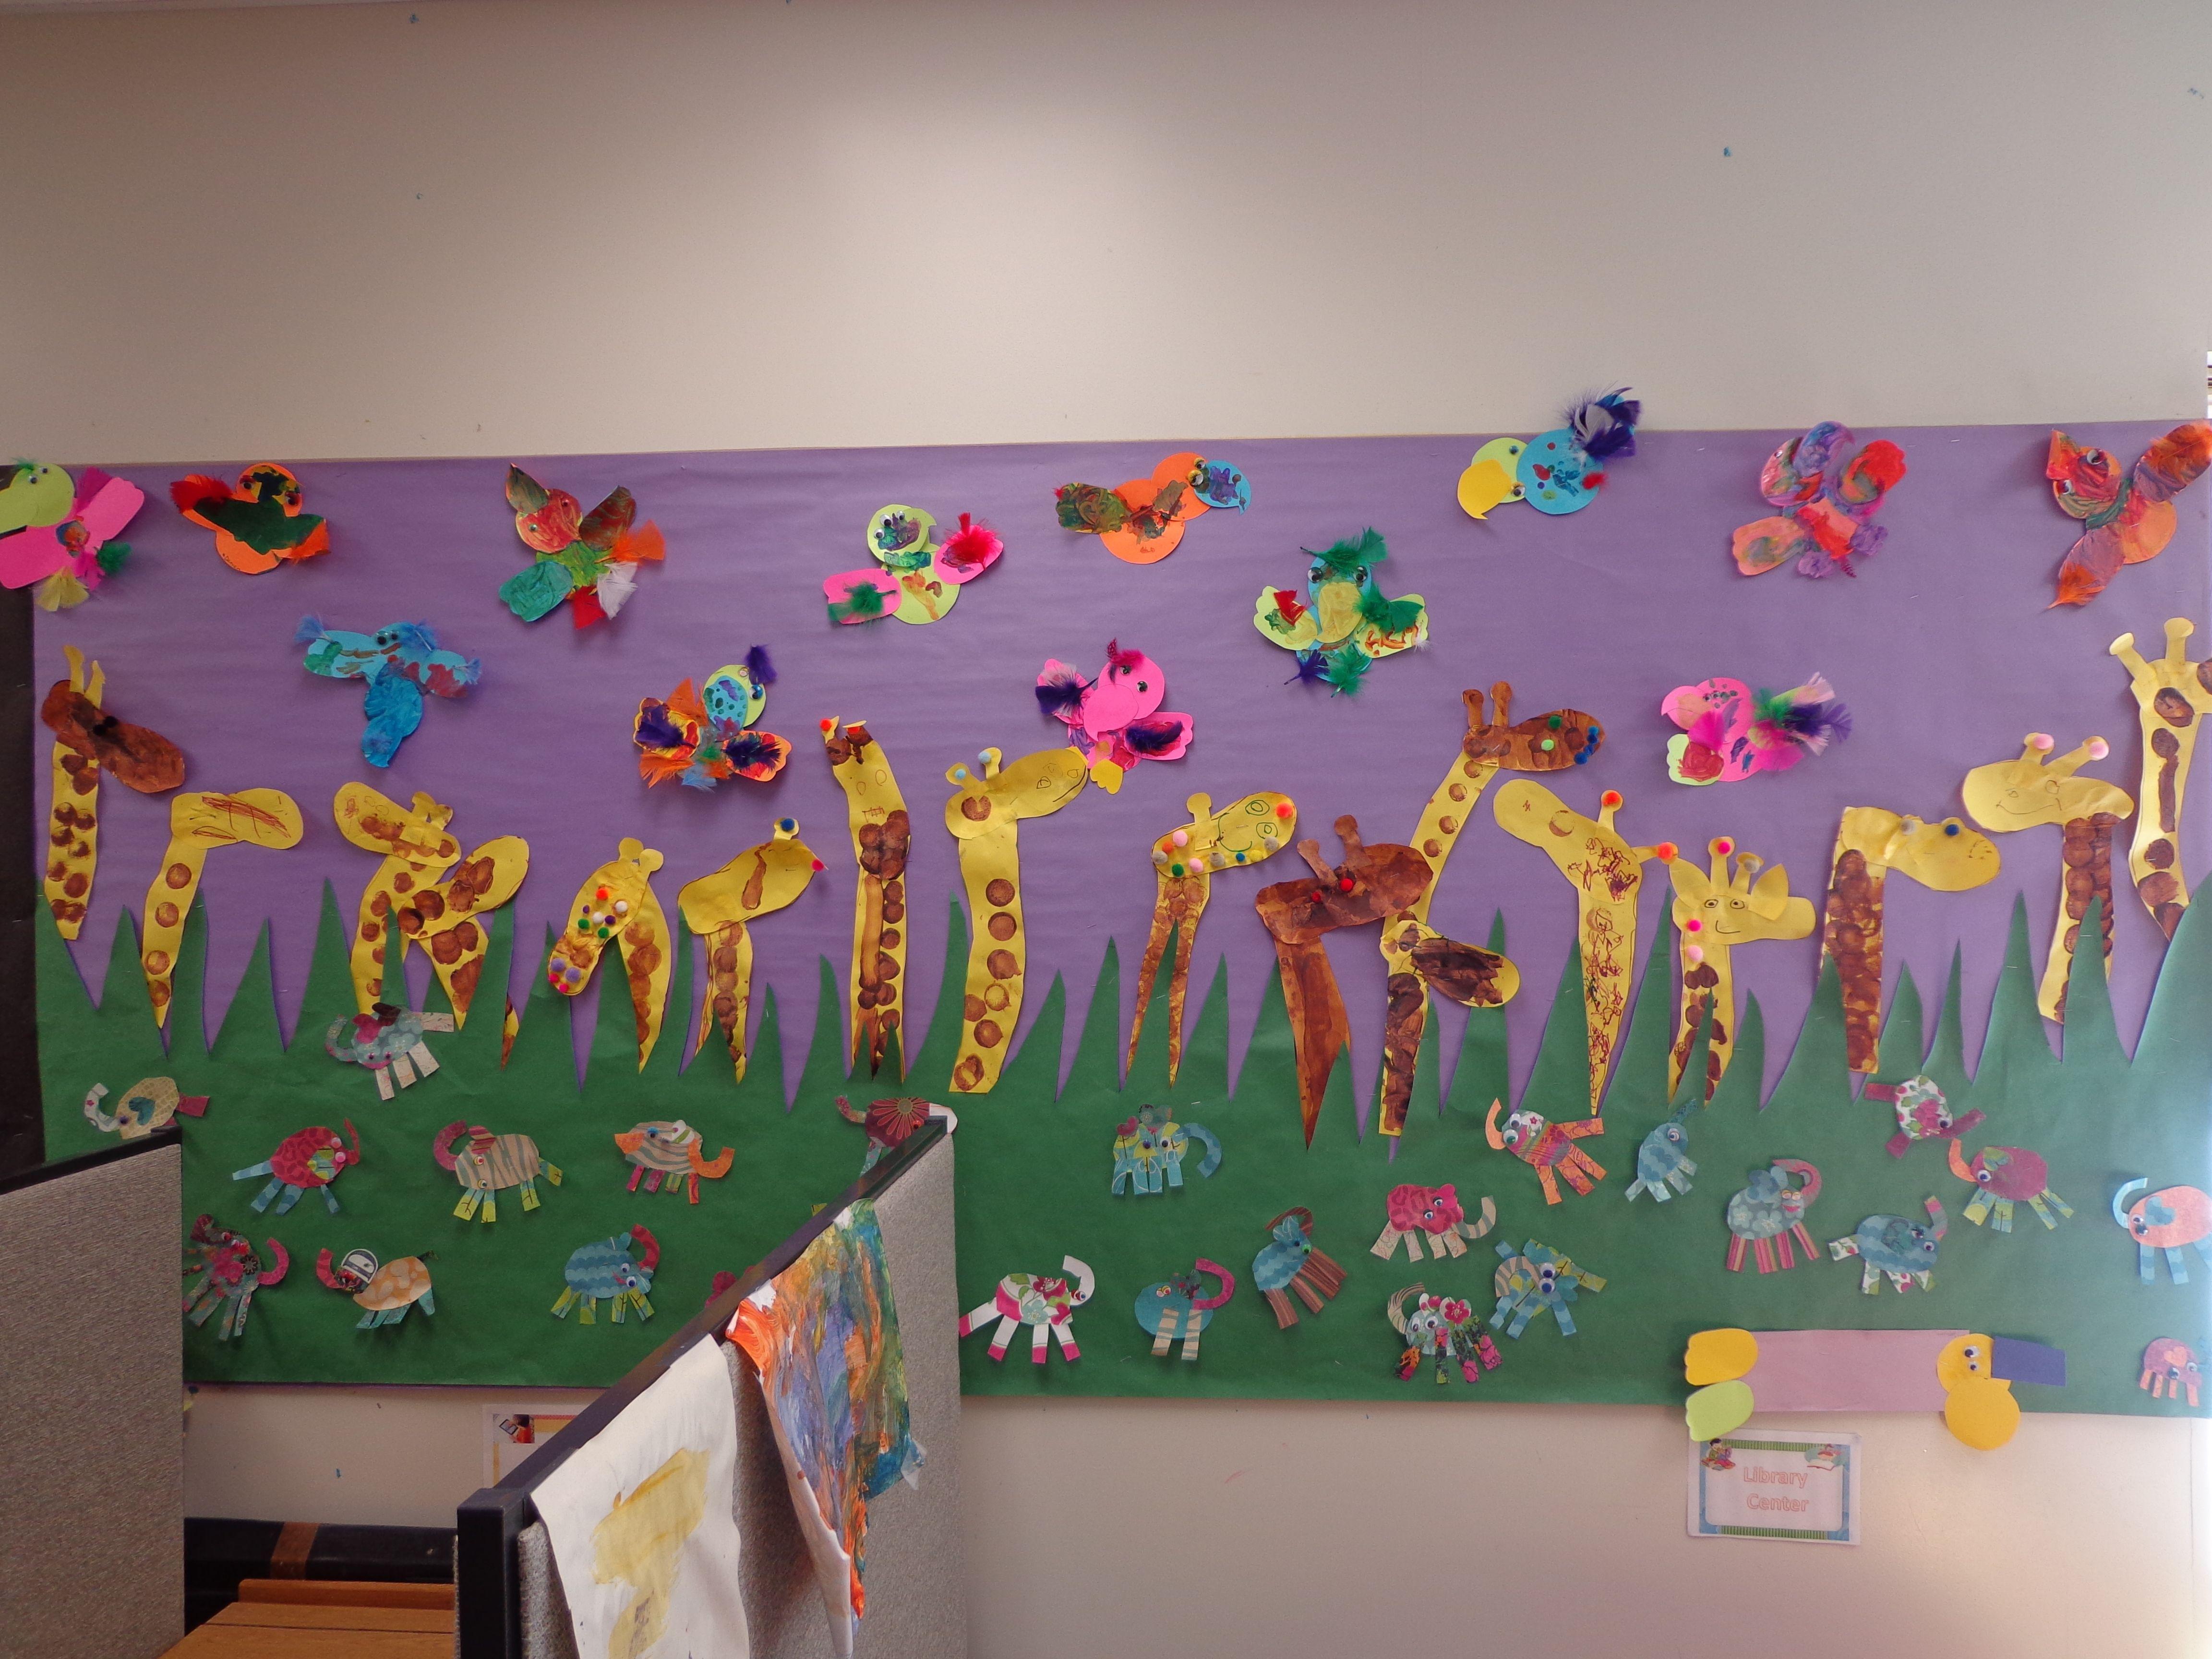 Best paint colors for preschool classrooms - Preschool Jungle Theme Bulletin Board Giraffes Parrots Elephants